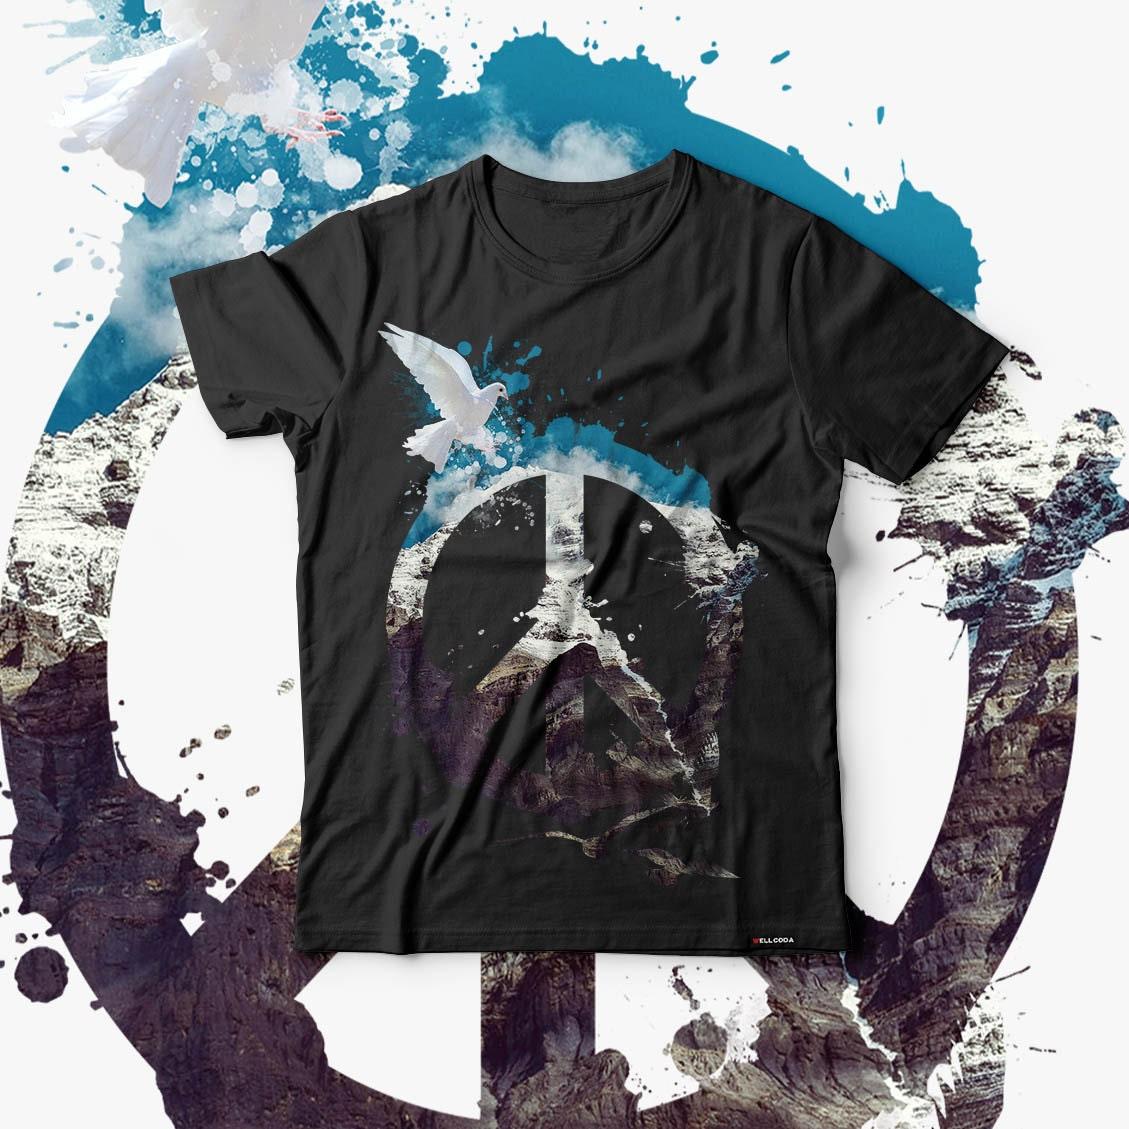 Animal Peace and Love Bird Life Men Black Tshirt S5XL NEW  Wellcoda